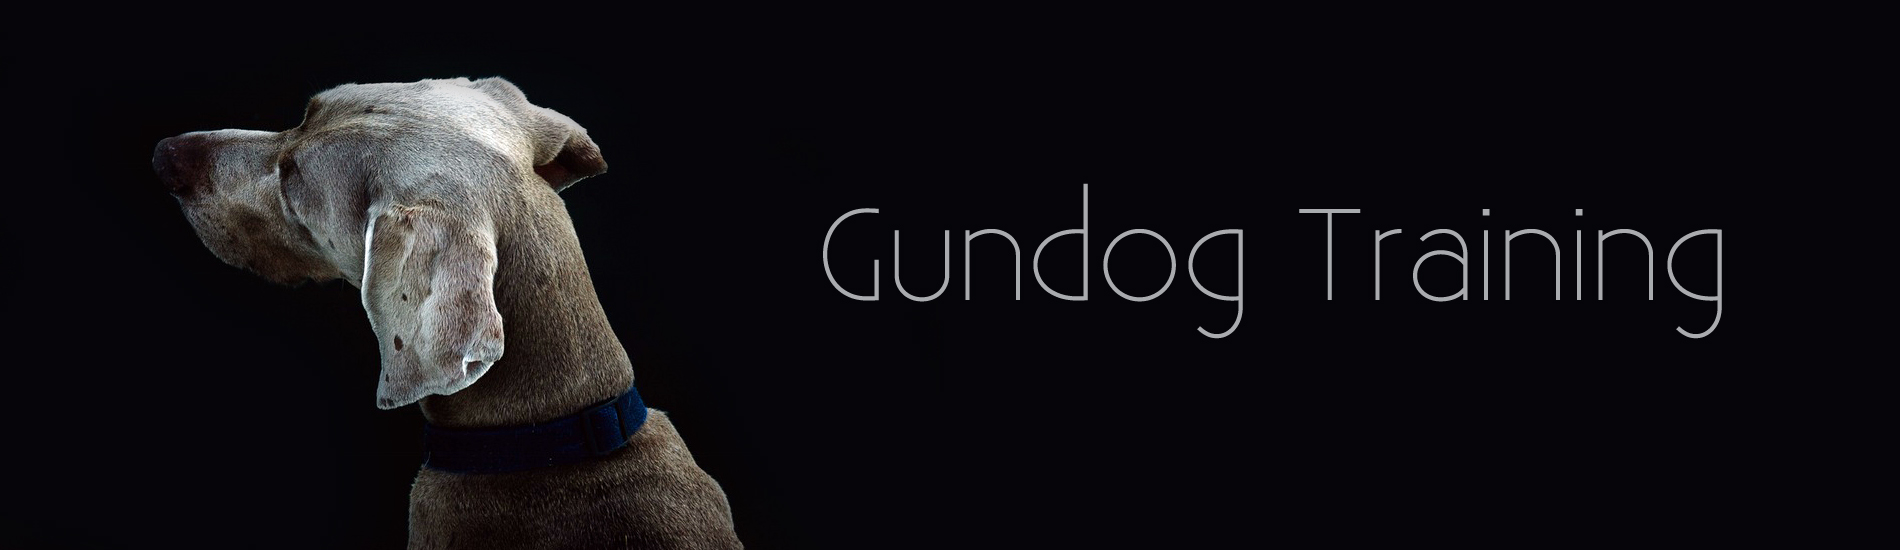 Gundog training slider